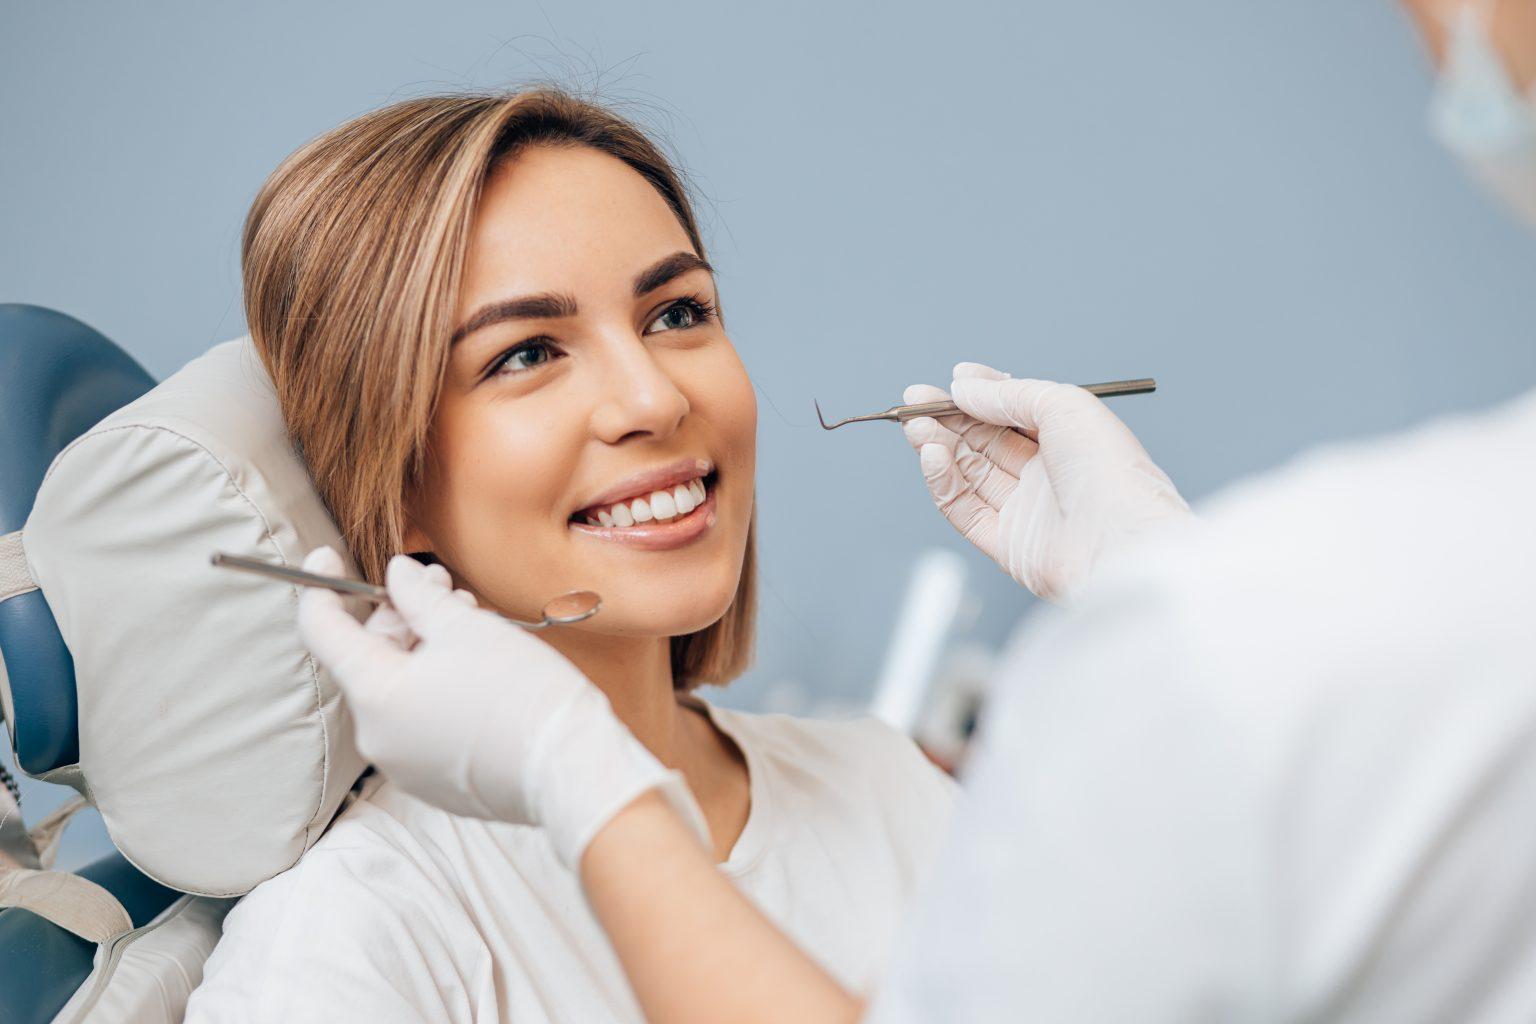 Beautiful Young Woman In Dental Examination